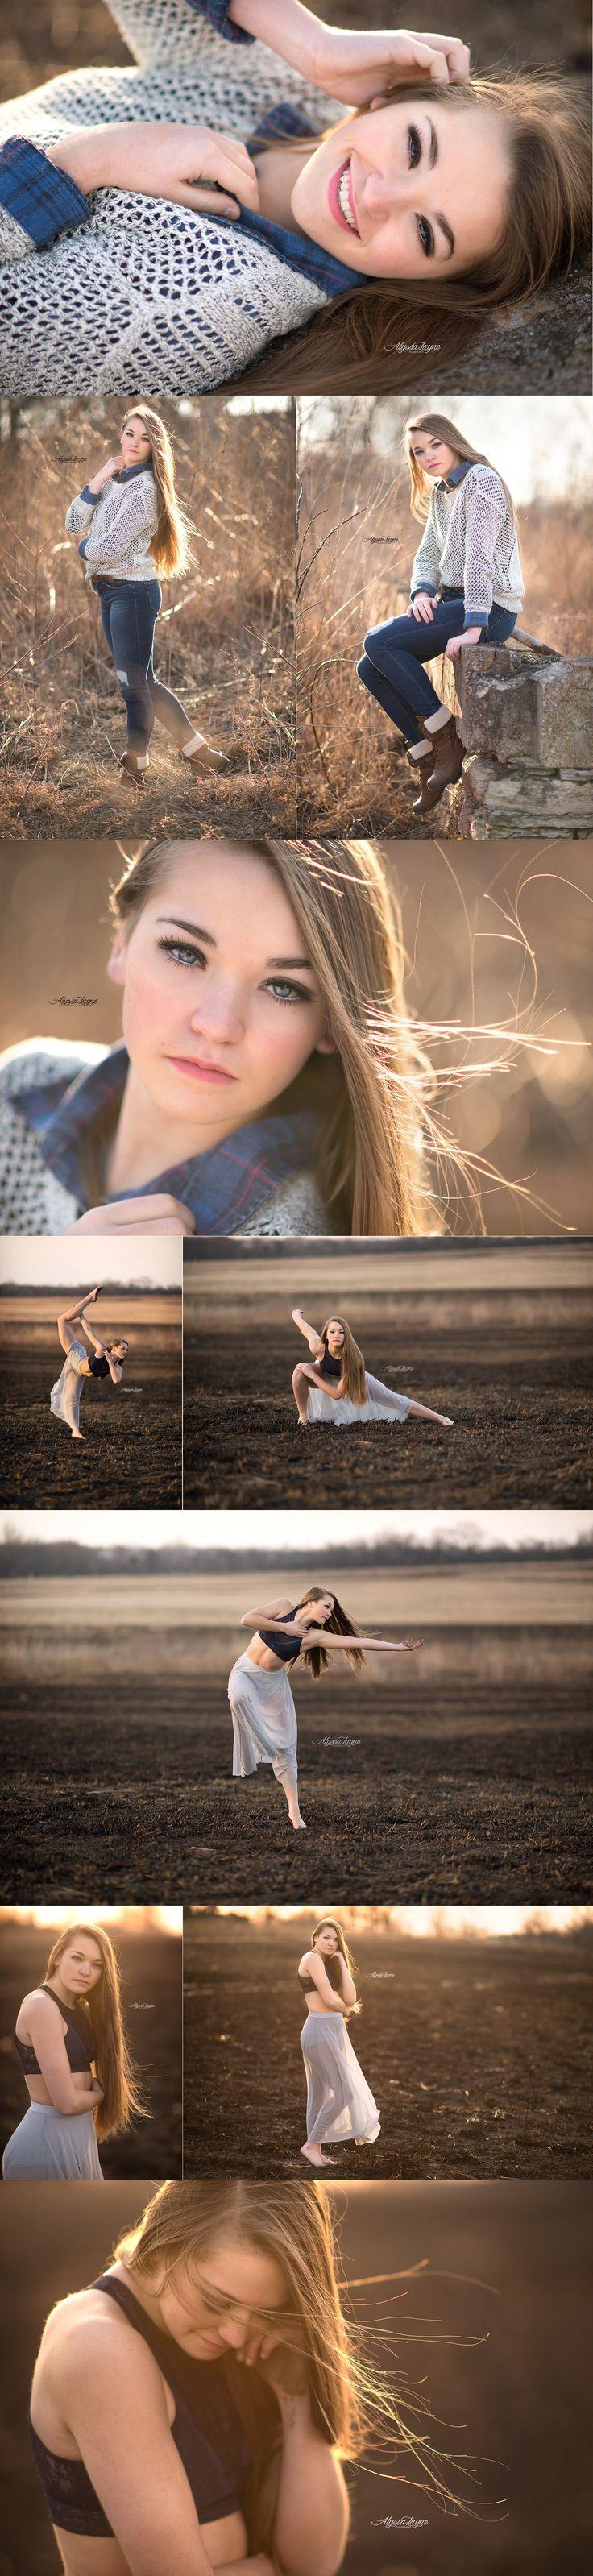 Senior photographer | Senior pictures | posing ideas | senior pose | dancer | ballerina | Illinois photographer | senior pictures | chicago photographer | Alyssa Layne Photography